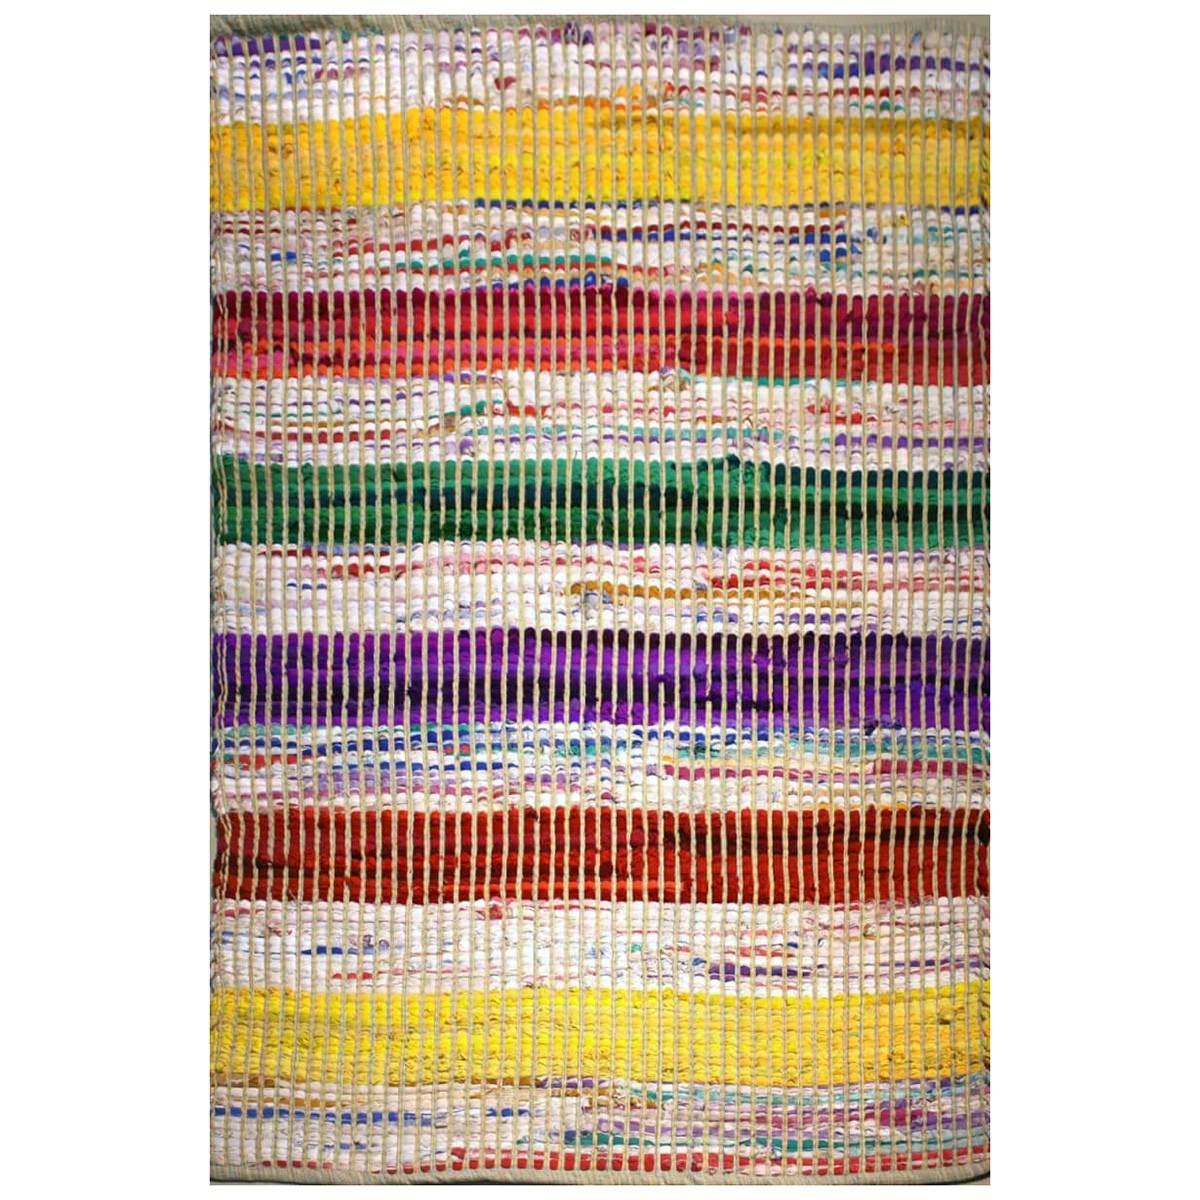 Lulu Recycled Fabric Chindi Rug, 130x70cm